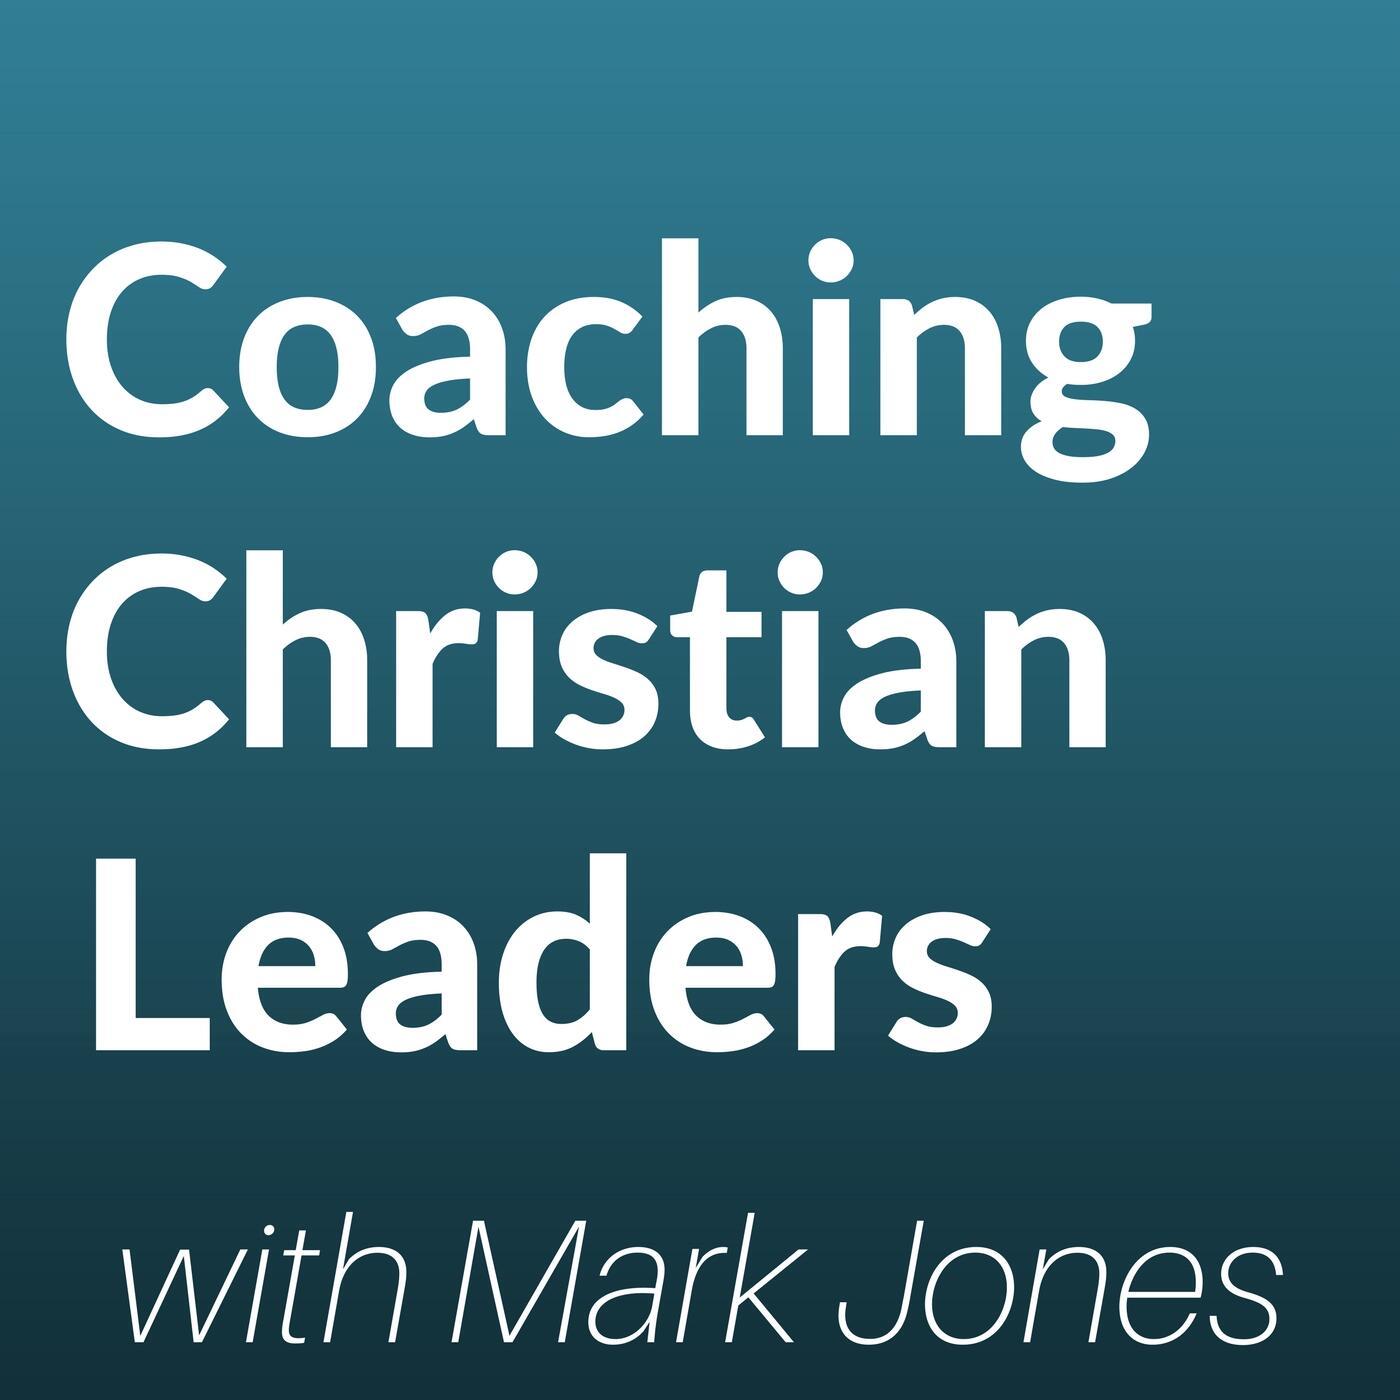 Coaching Christian Leaders